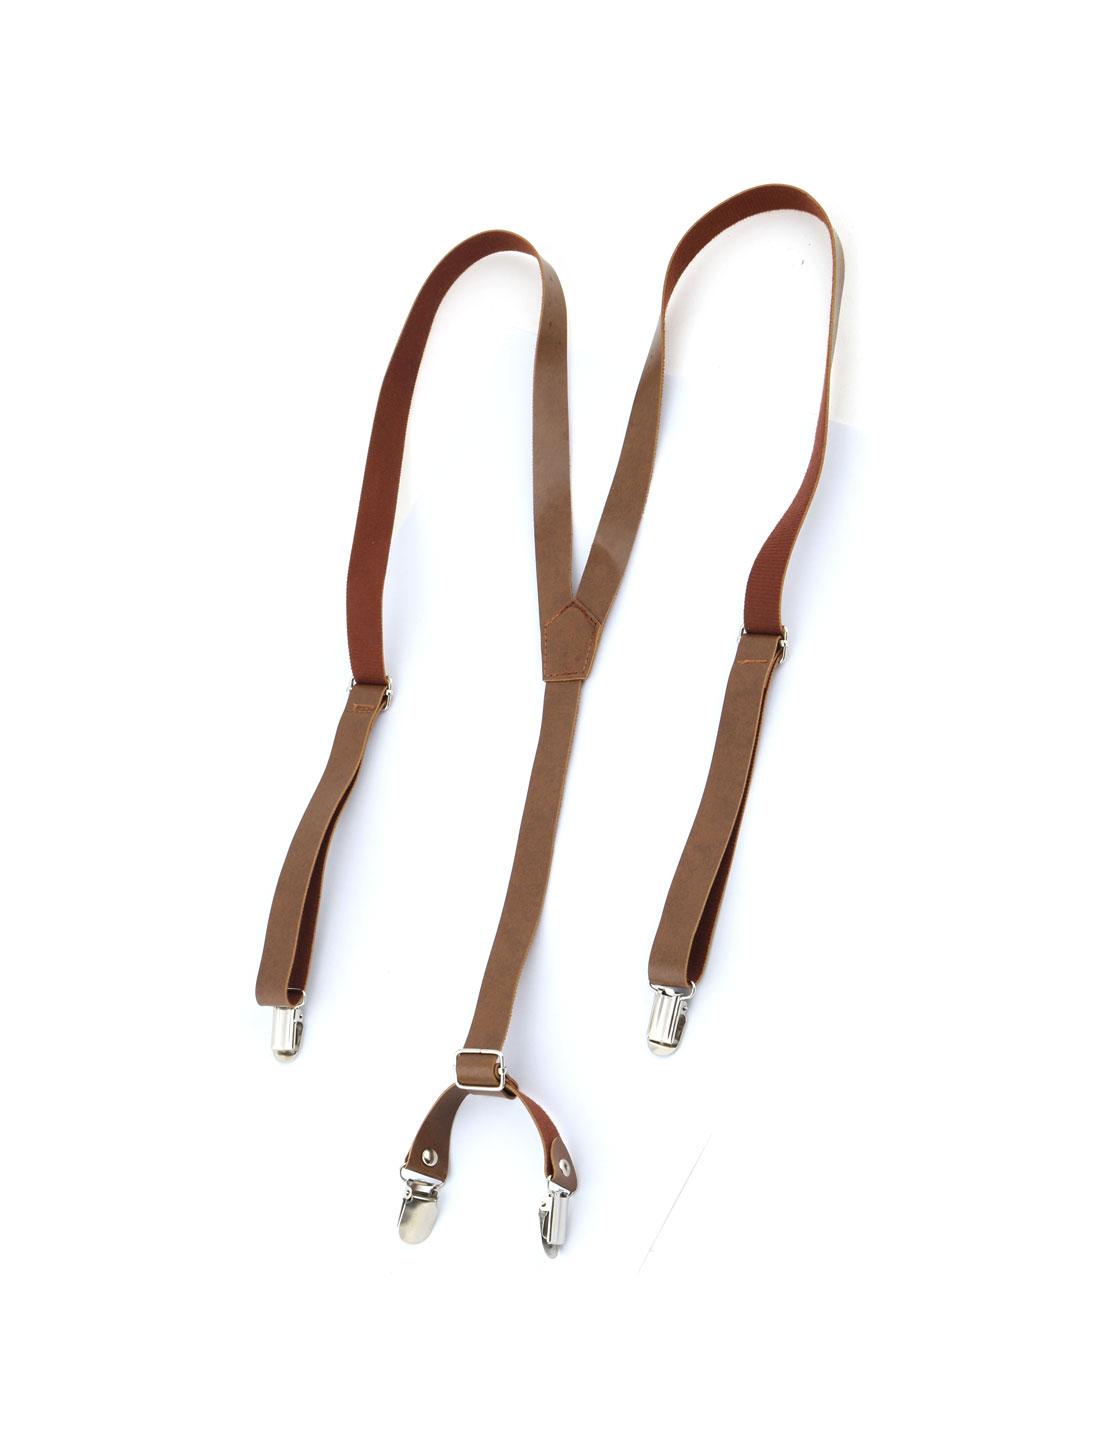 Adult Faux Leather Y-Shaped Back Adjustable Suspenders Braces Straps Brown